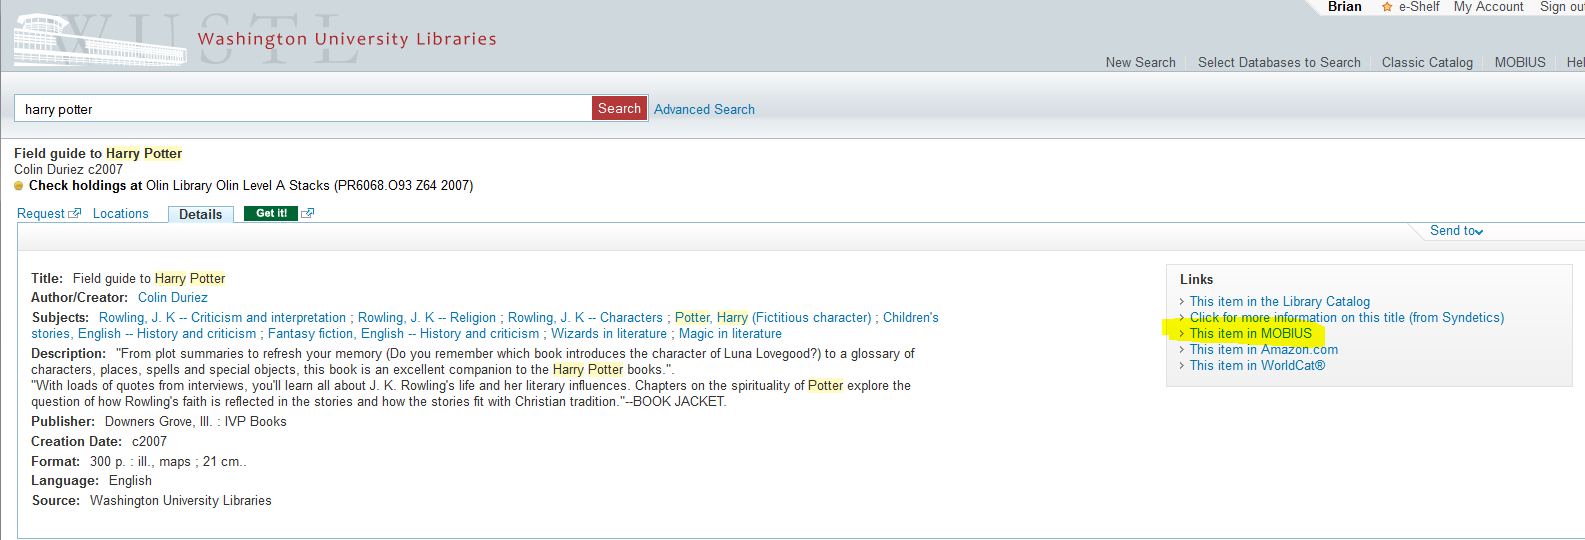 Screenshot showing MOBIUS link